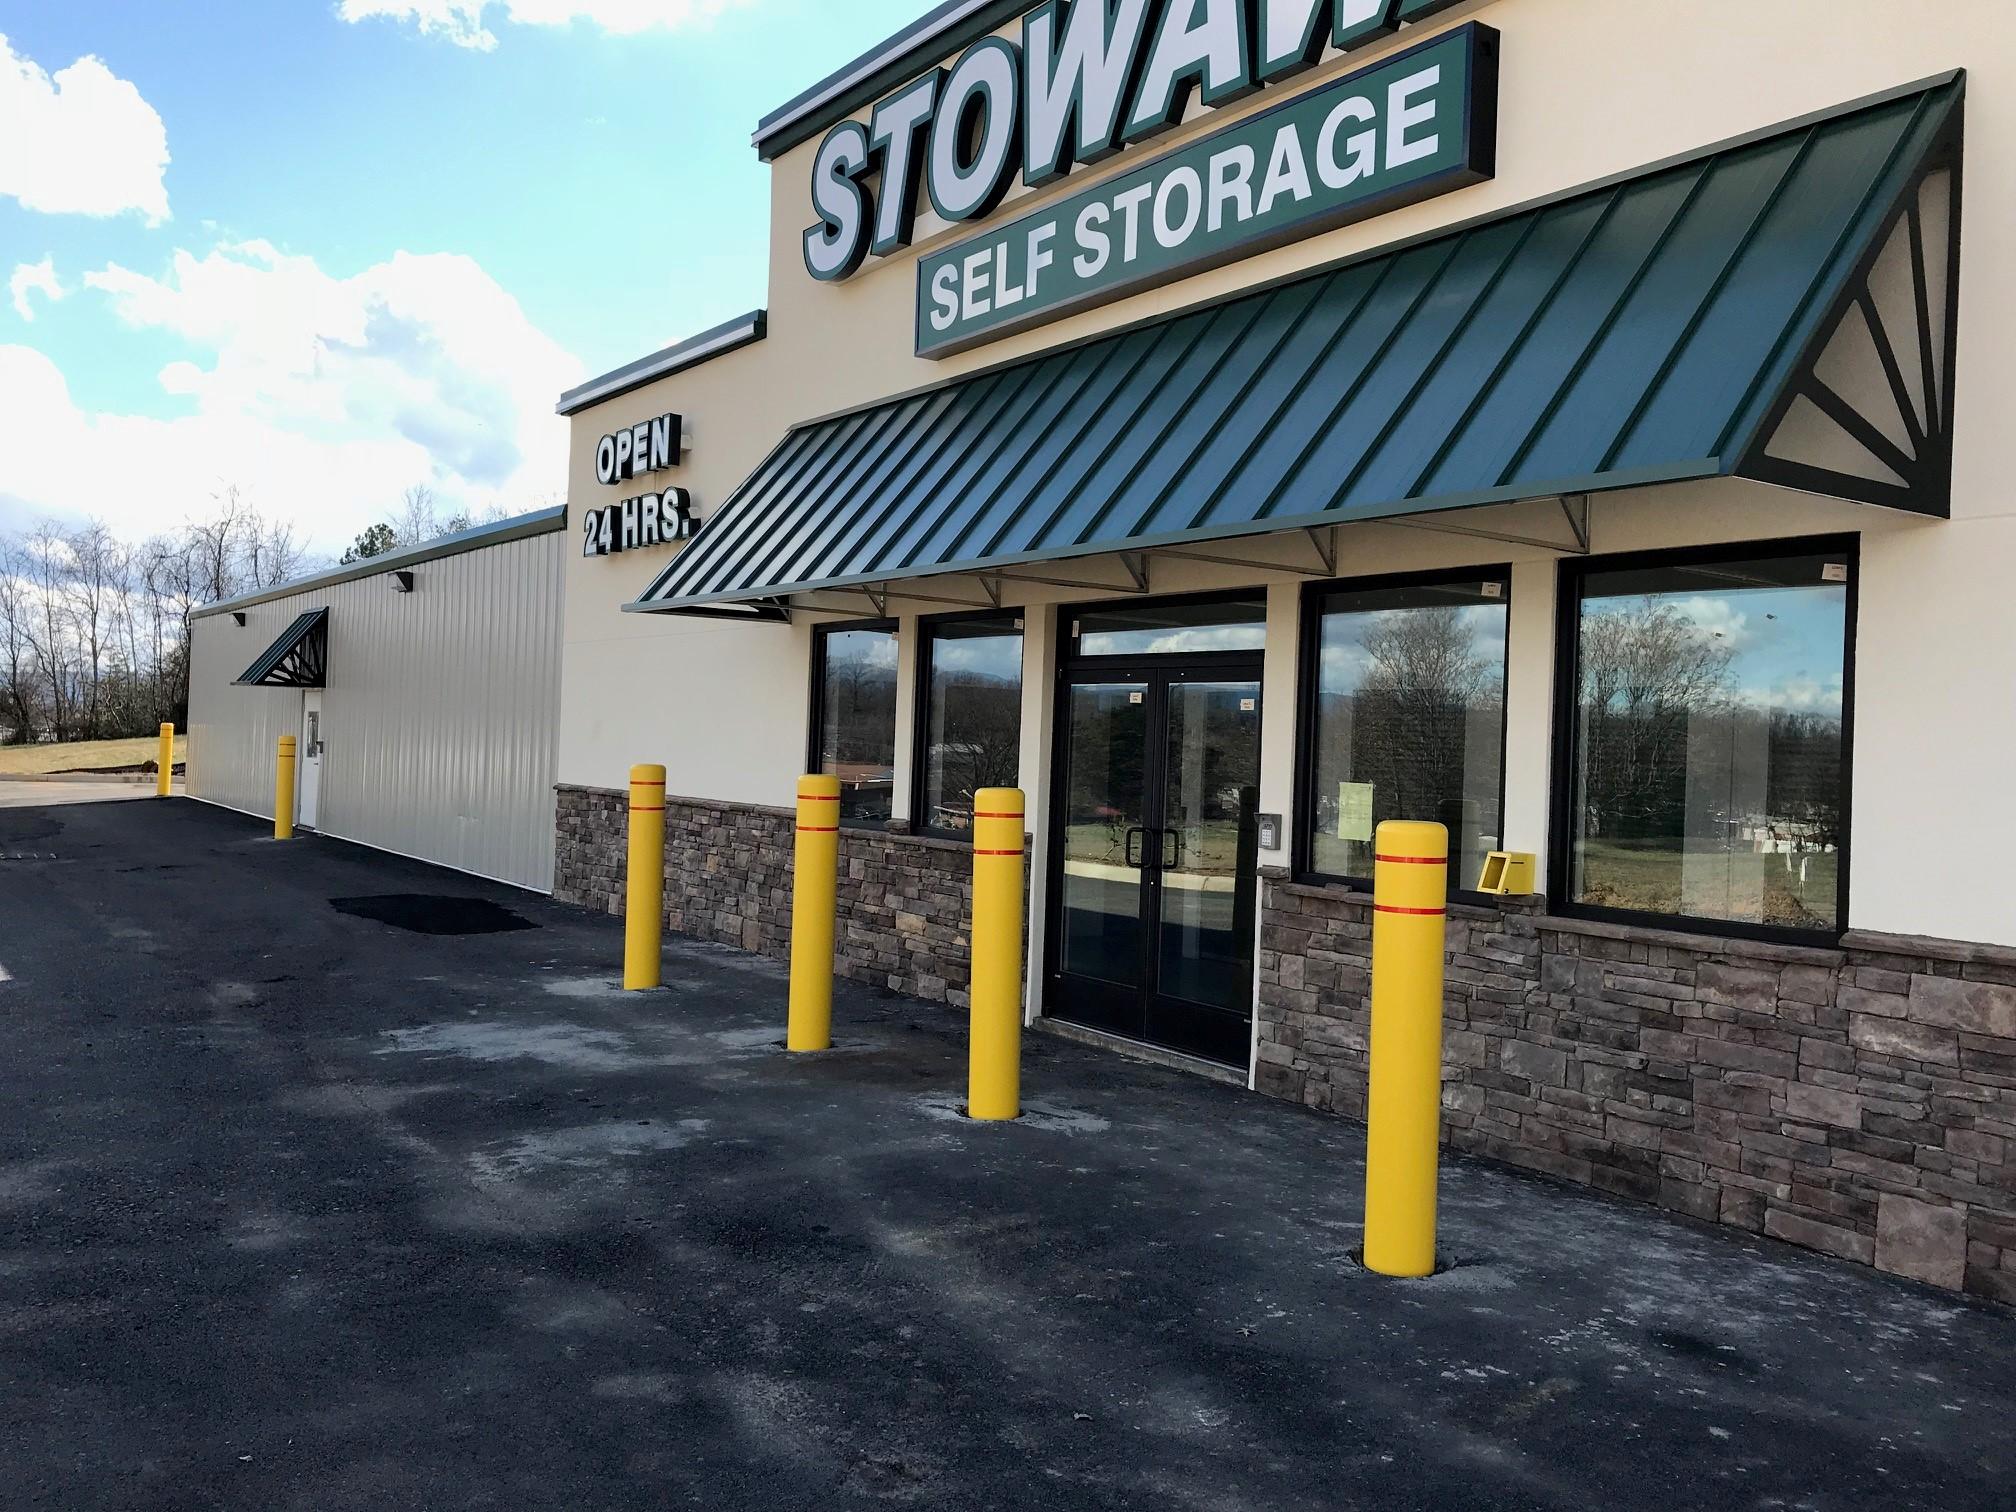 Stowaway Self Storage image 9